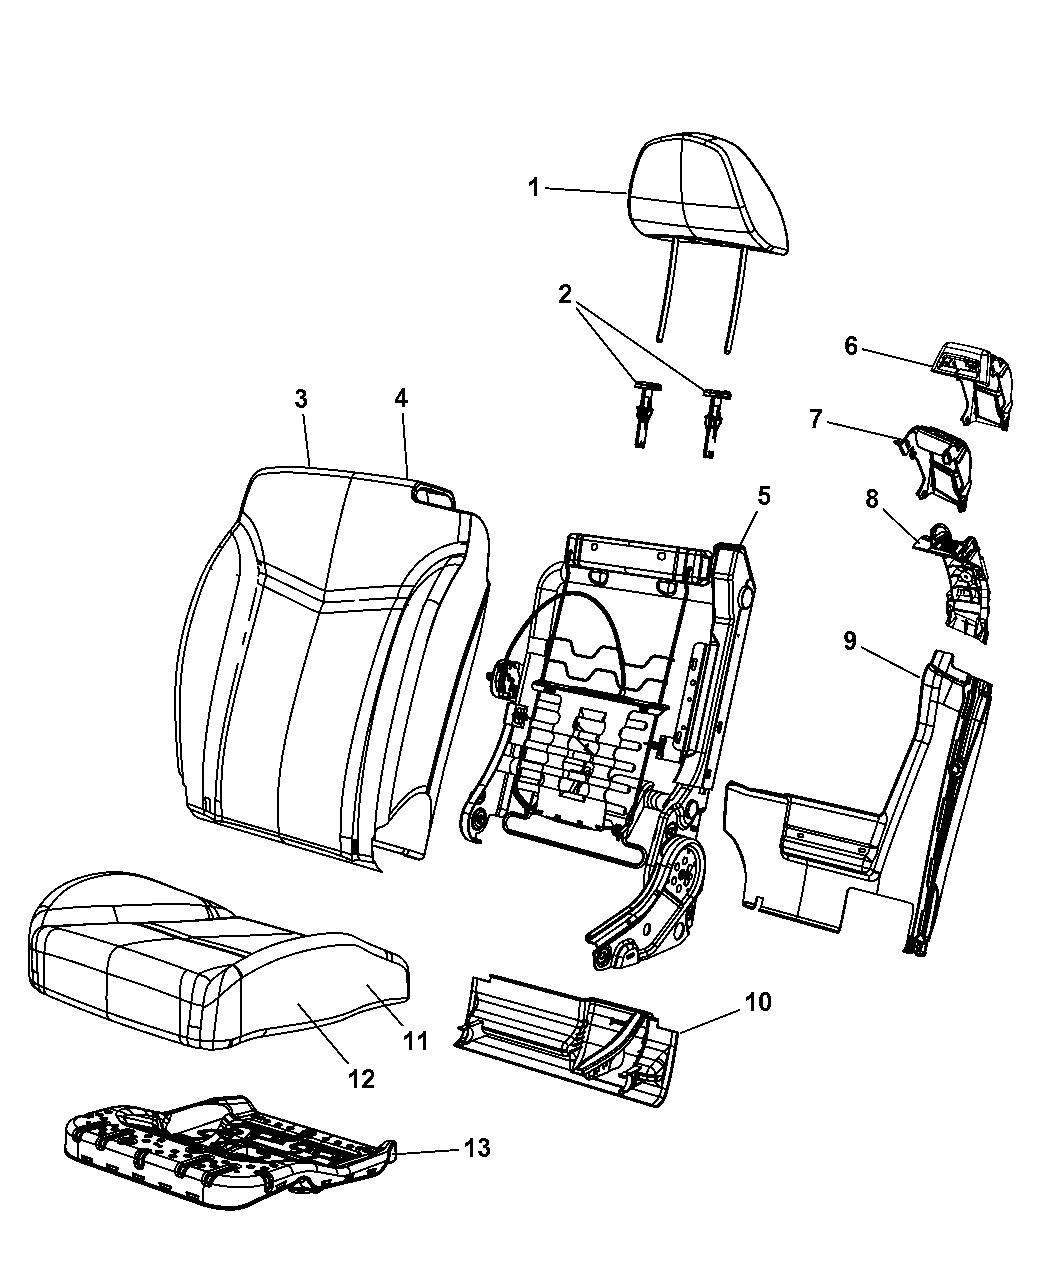 1fg661dbaa